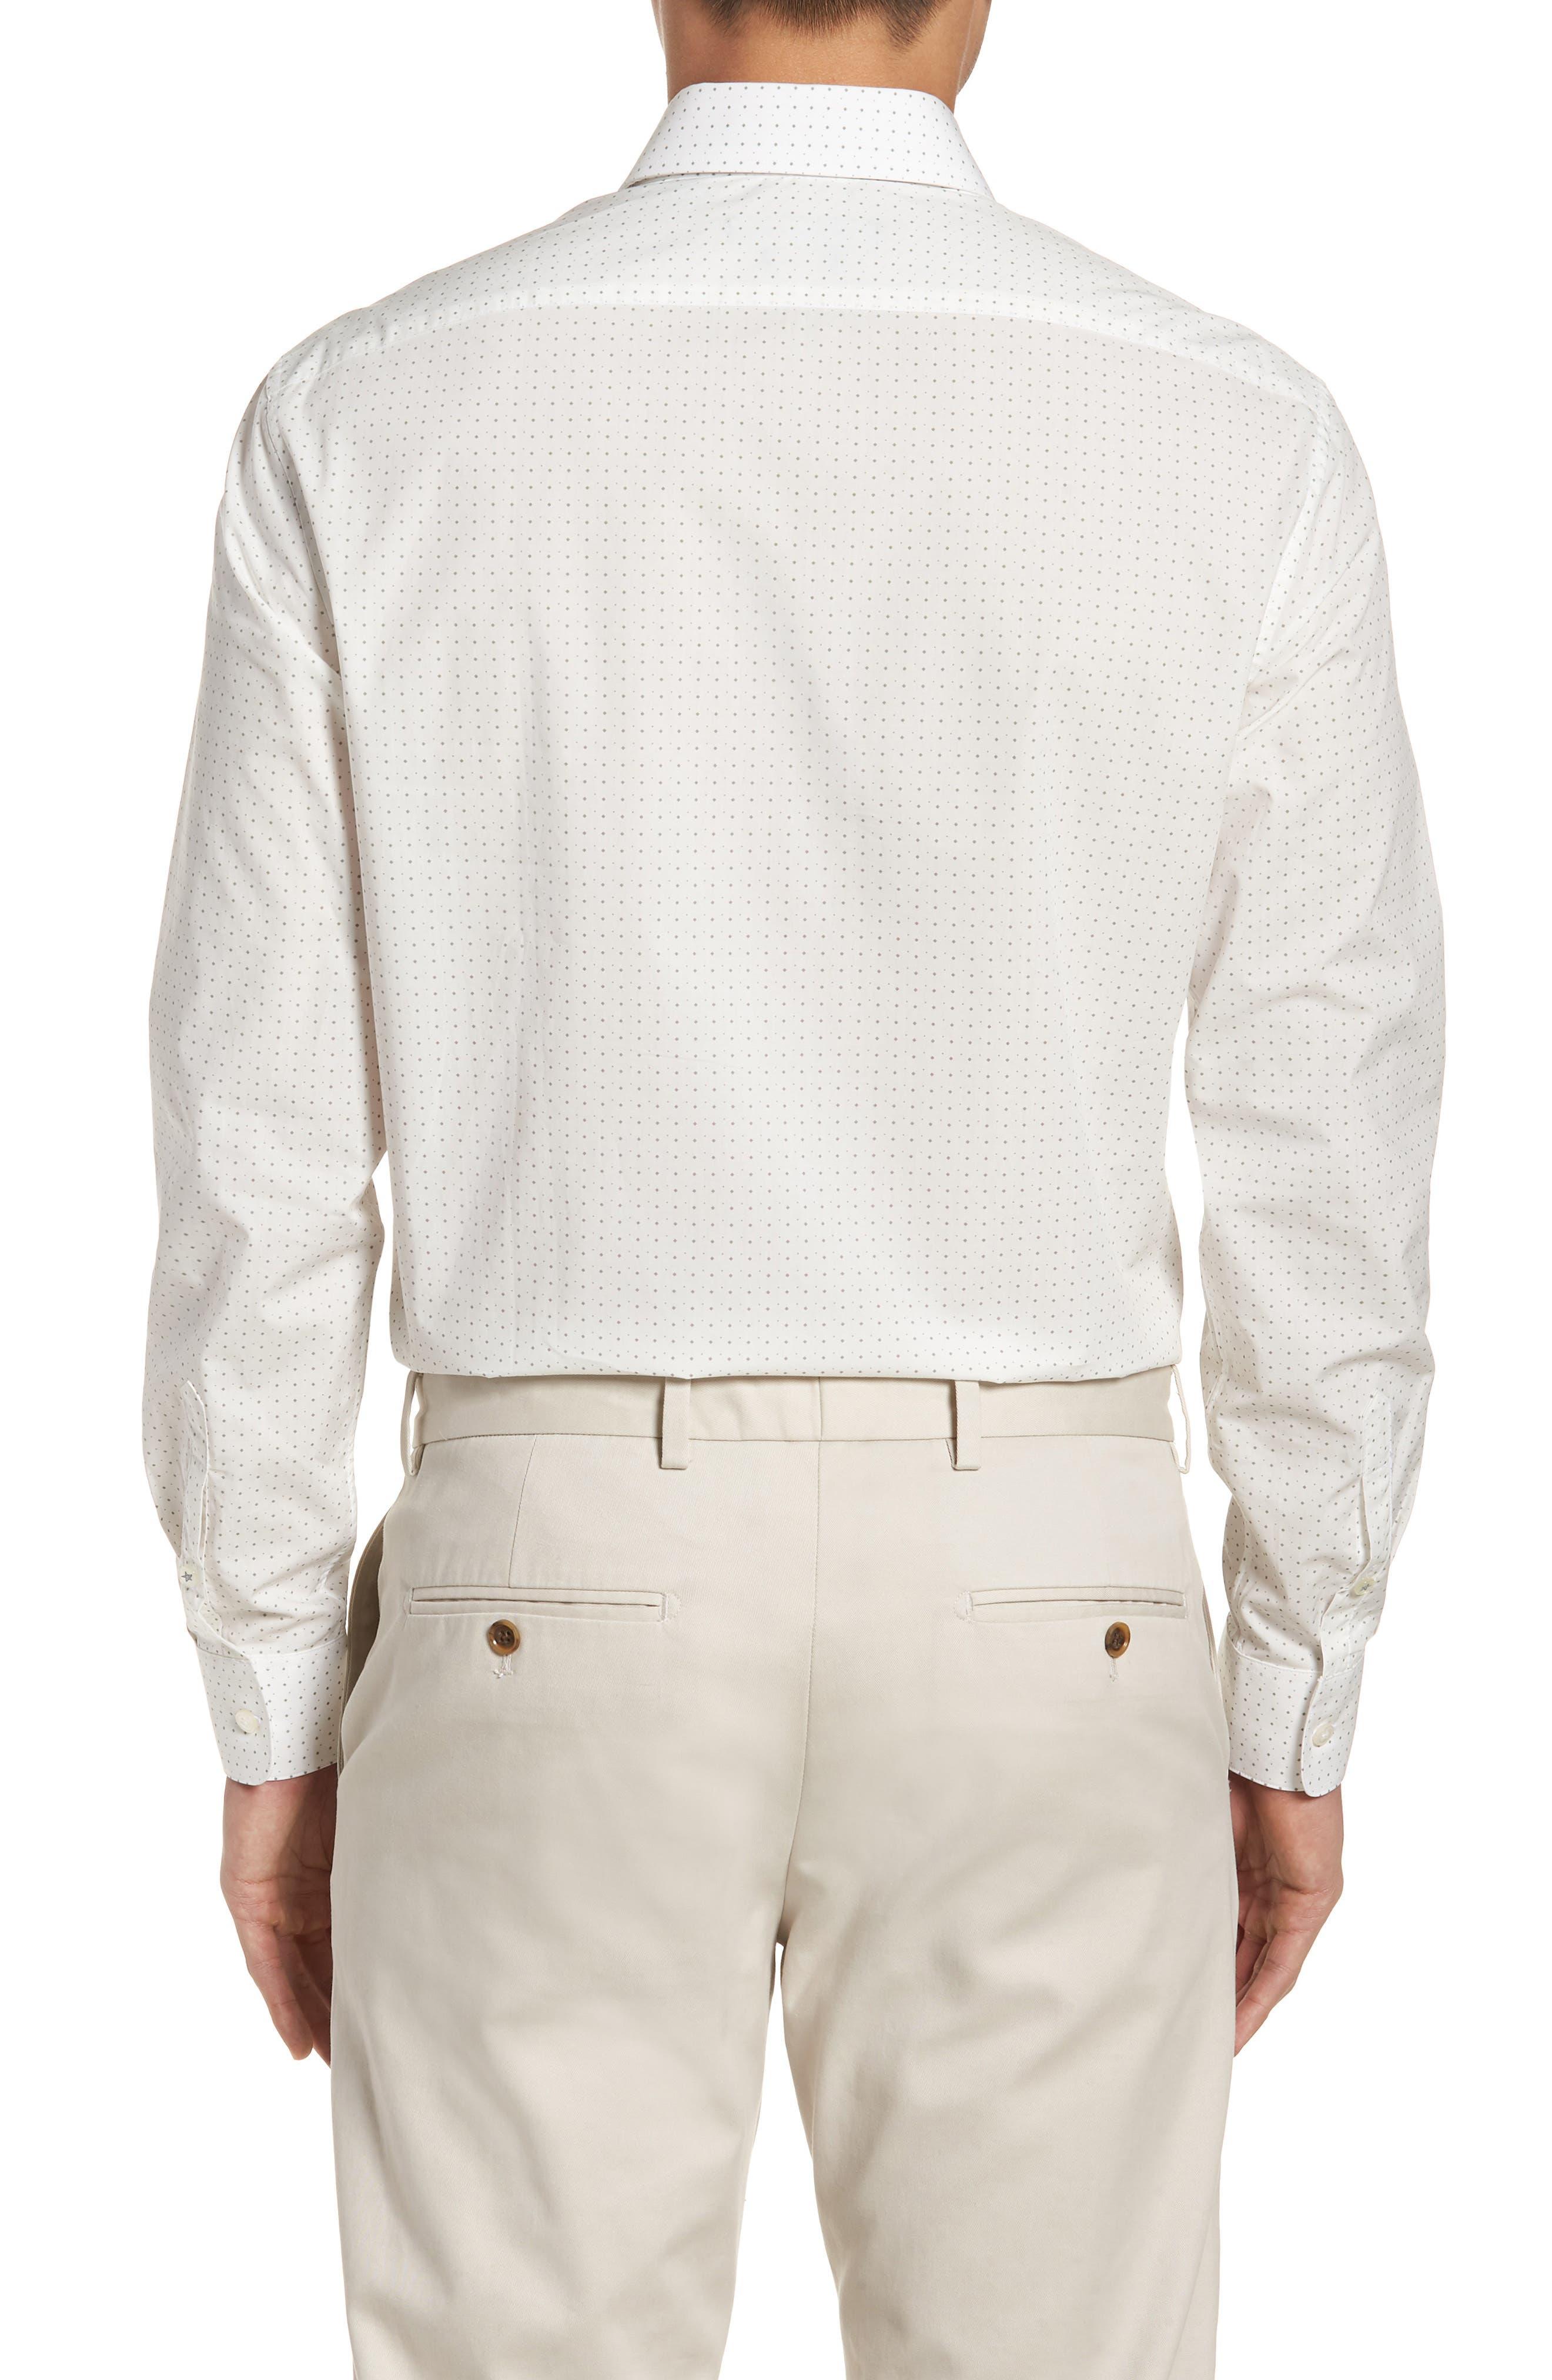 Regular Fit Diamond Dress Shirt,                             Alternate thumbnail 3, color,                             GRIFFIN GREY